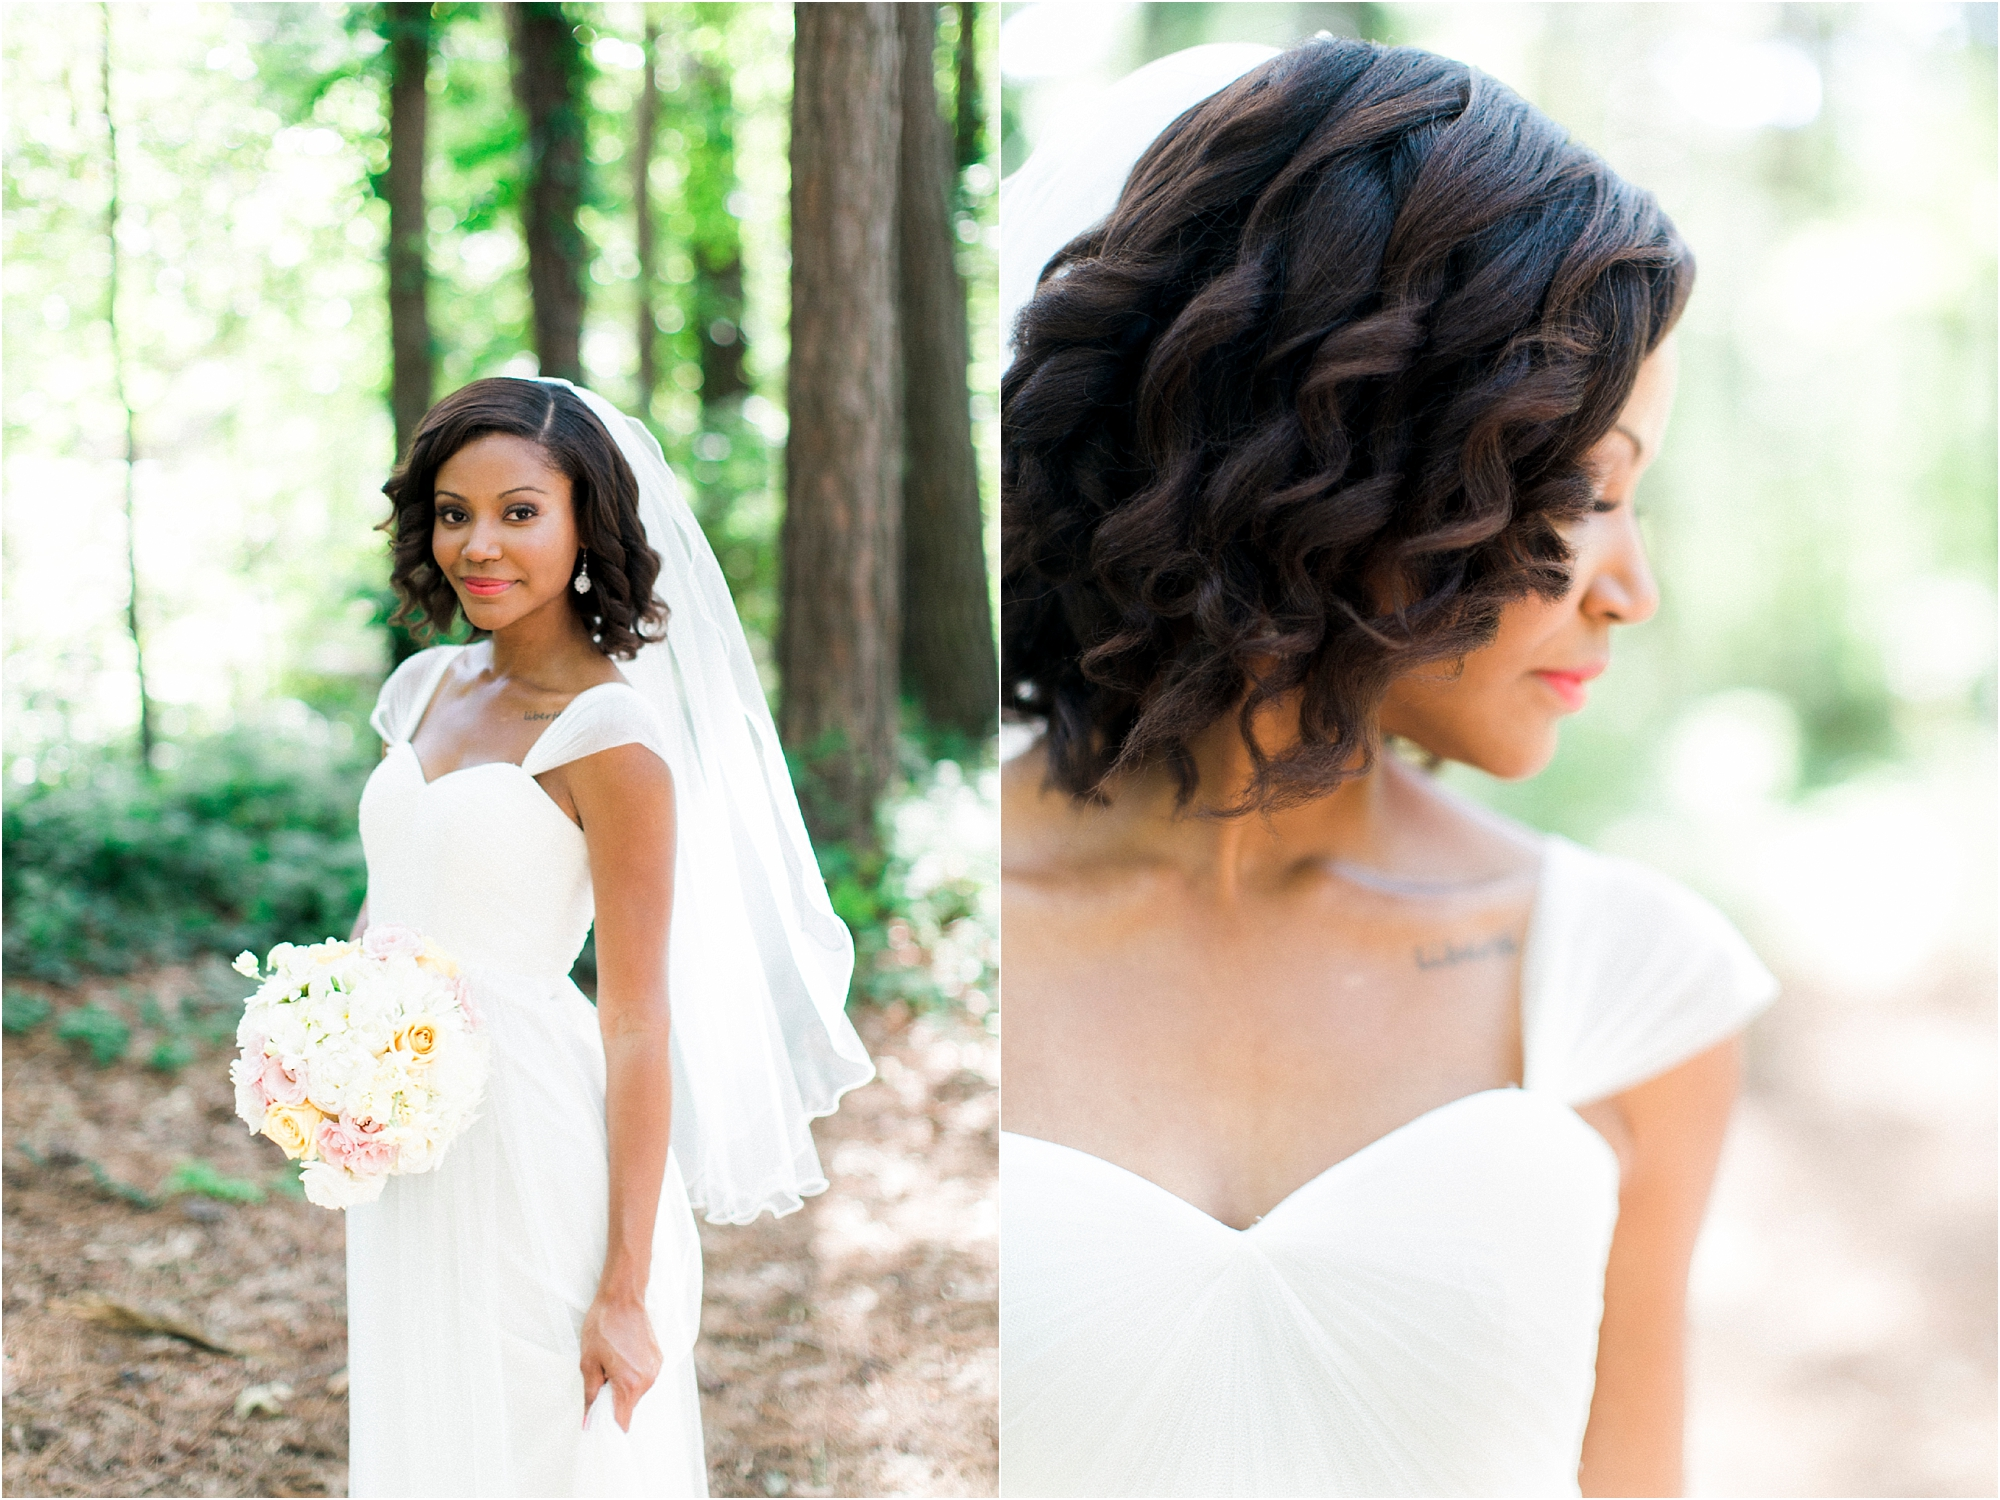 inimate-richmond-virginia-backyard-summer-wedding-photos_0024.jpg